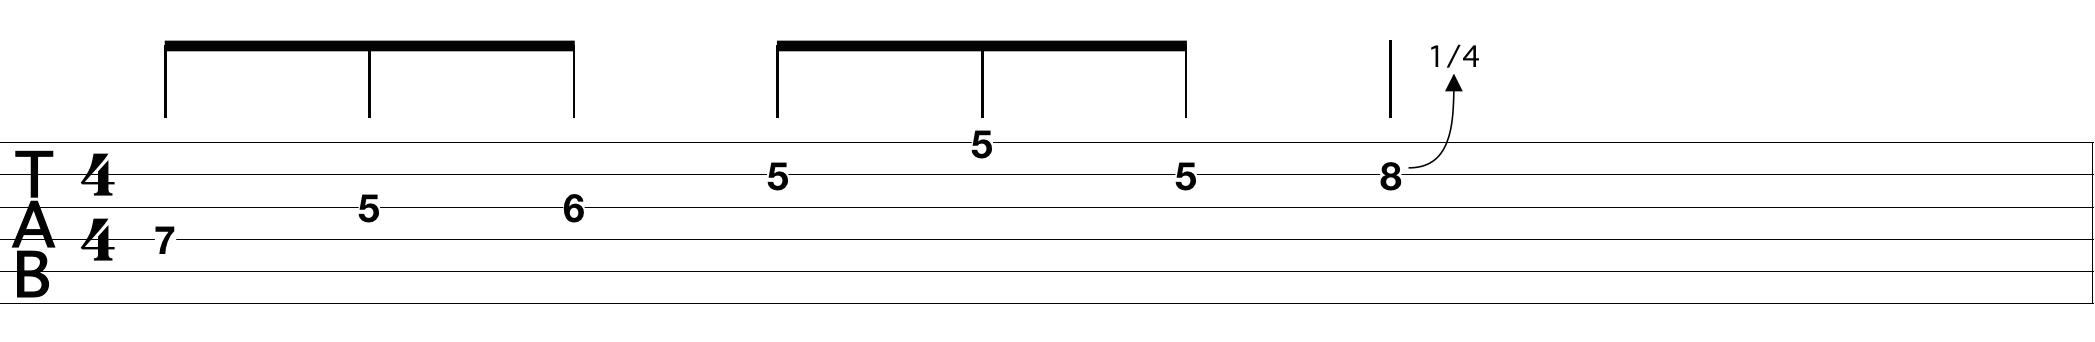 blues-tab-guitar_1.png